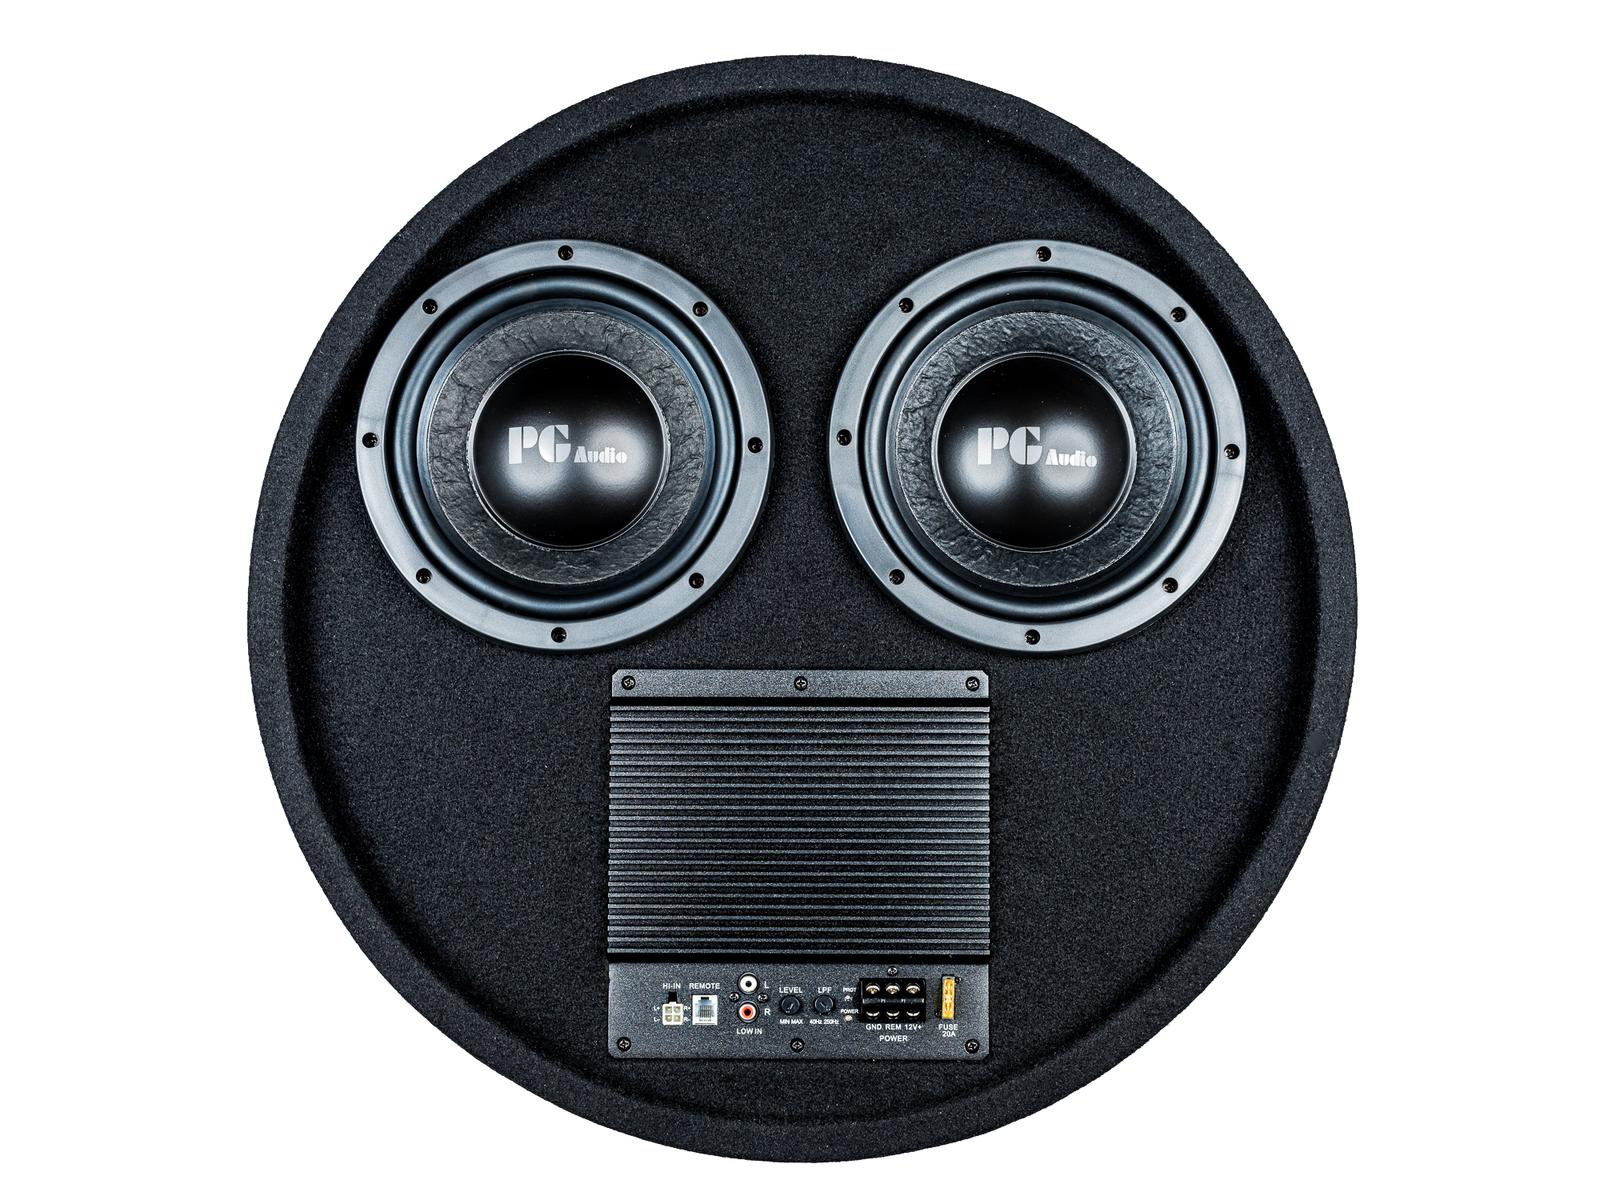 PG Audio aktiver Reserverad Subwoofer 2 x 8 Zoll ,1 Stück Neu 001